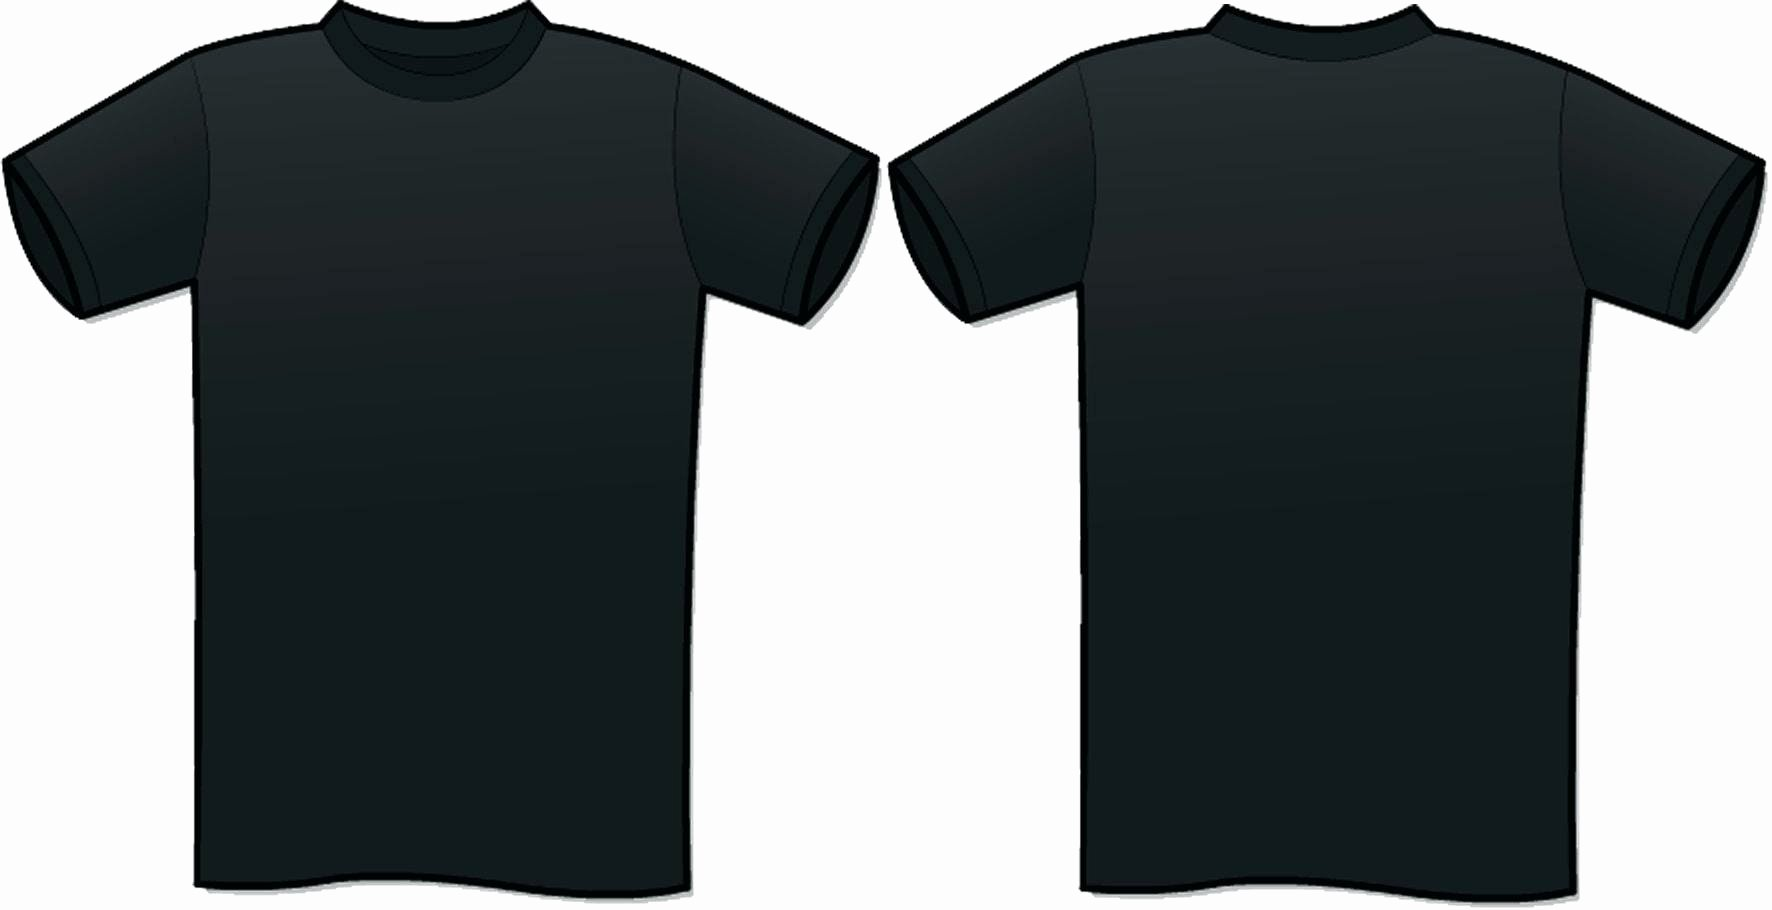 T Shirt Photoshop Template Beautiful Blank T Shirt Template